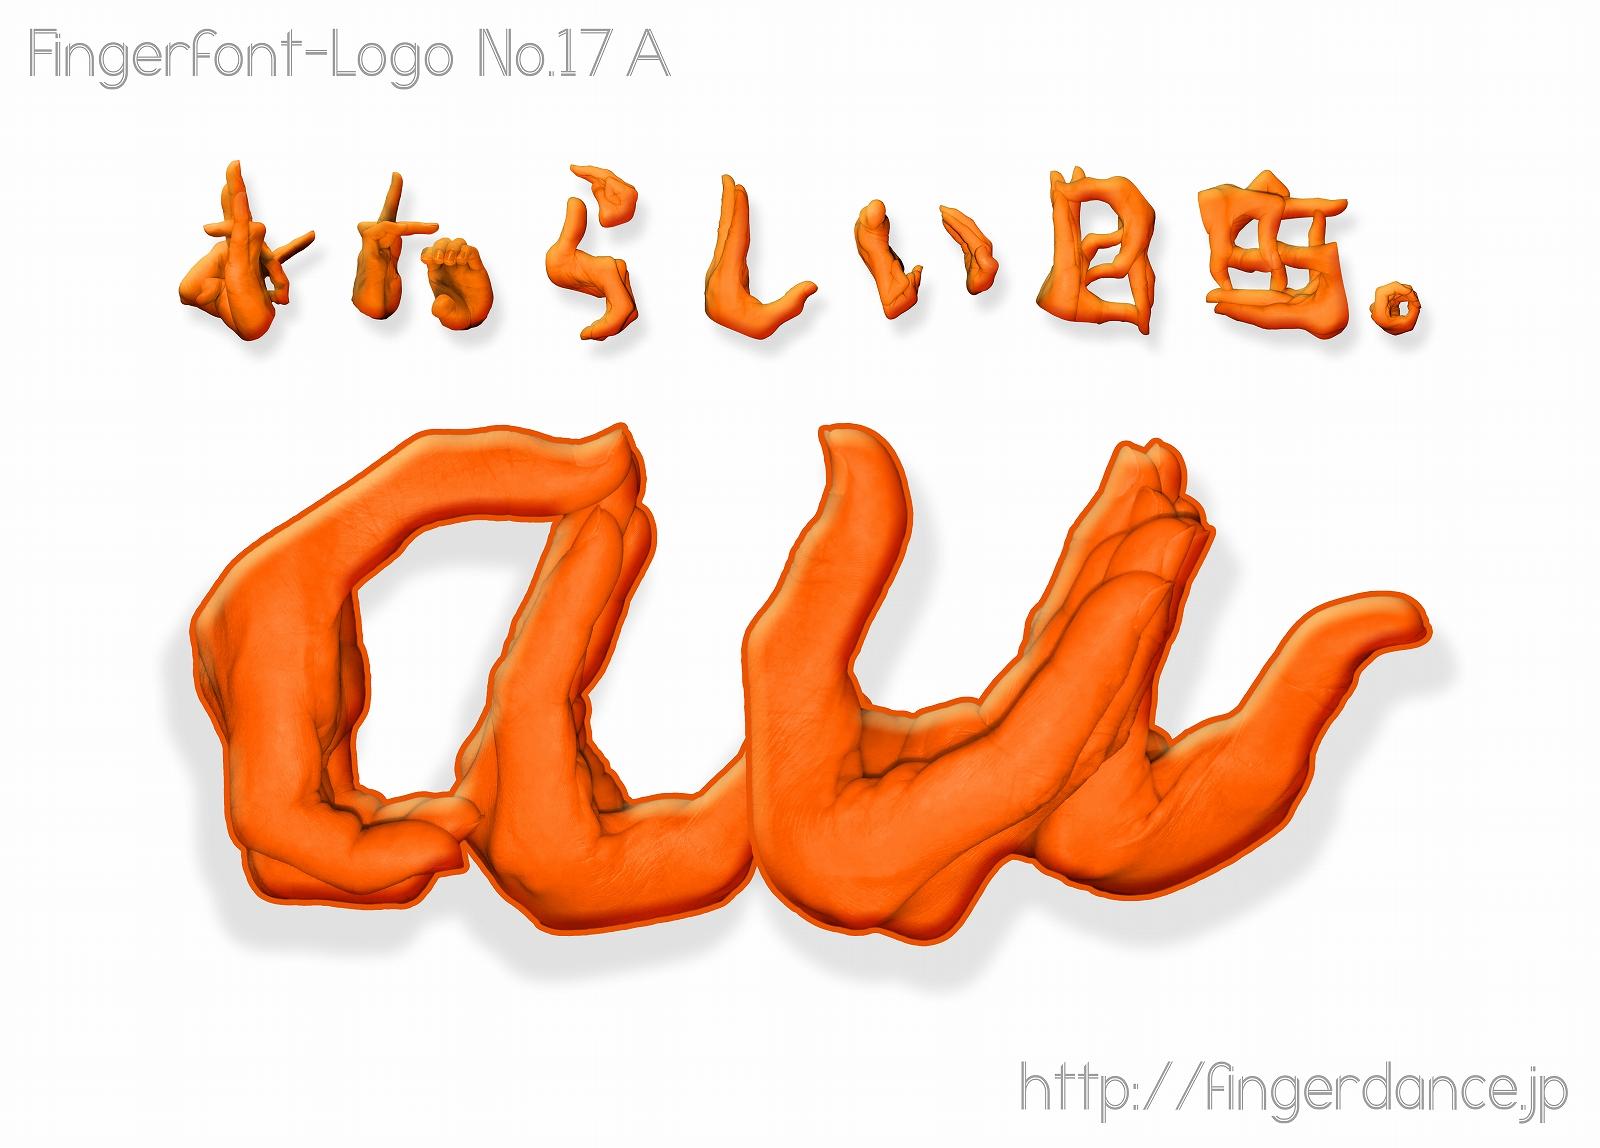 au-fingerhttp://fingerdance.jp/L/logohand KDDIフィンガーロゴハンド手指